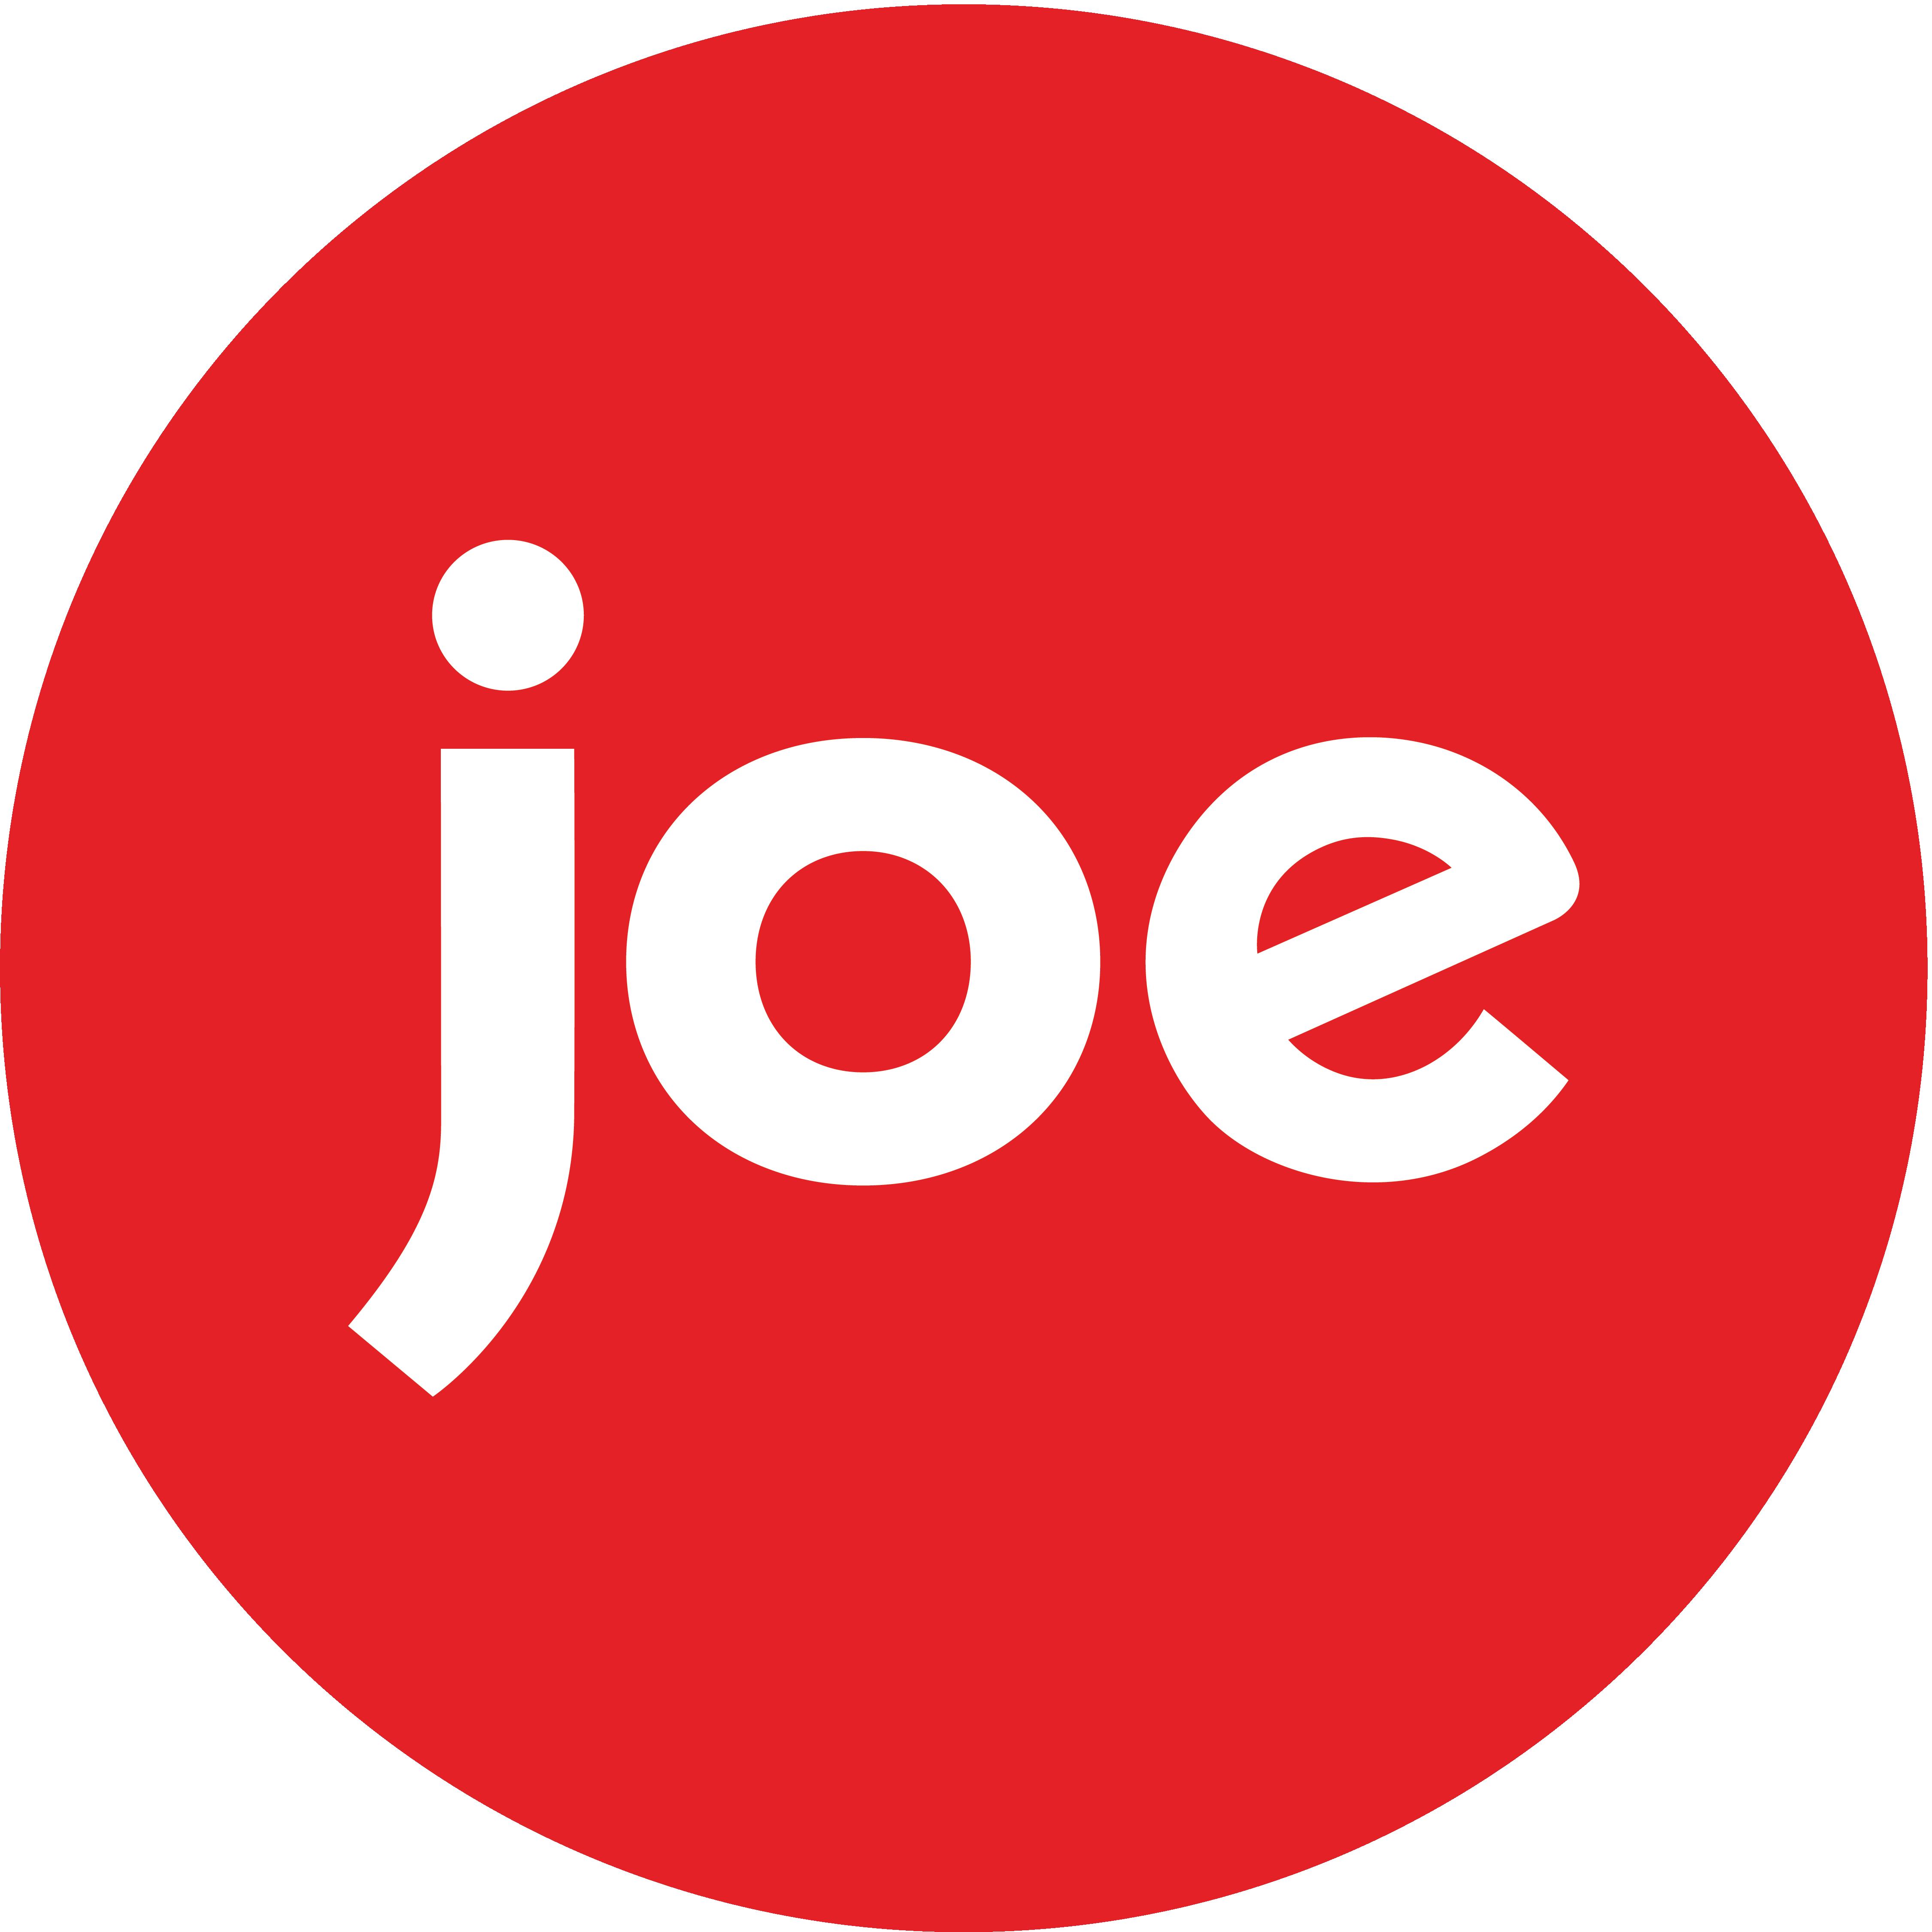 joe-logo-2020-edition_joe logo white on red (4)